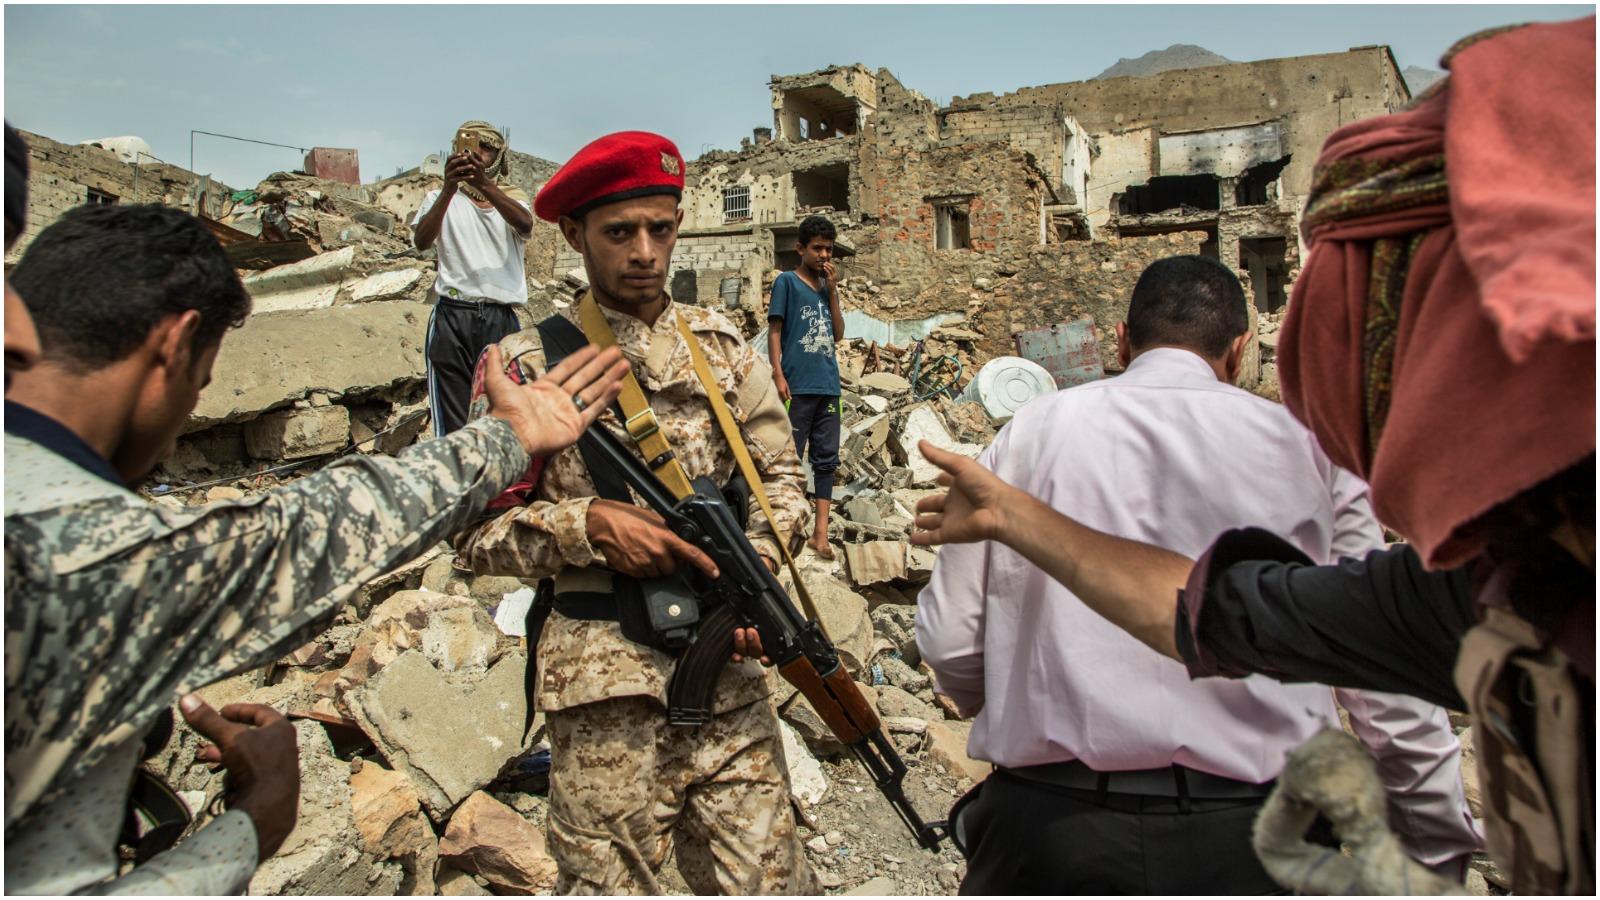 Professor Isa Blumi: Yemen er ikke en stedfortræderkrig mellem Iran og Saudi-Arabien – tværtimod er USA centrum for krigen